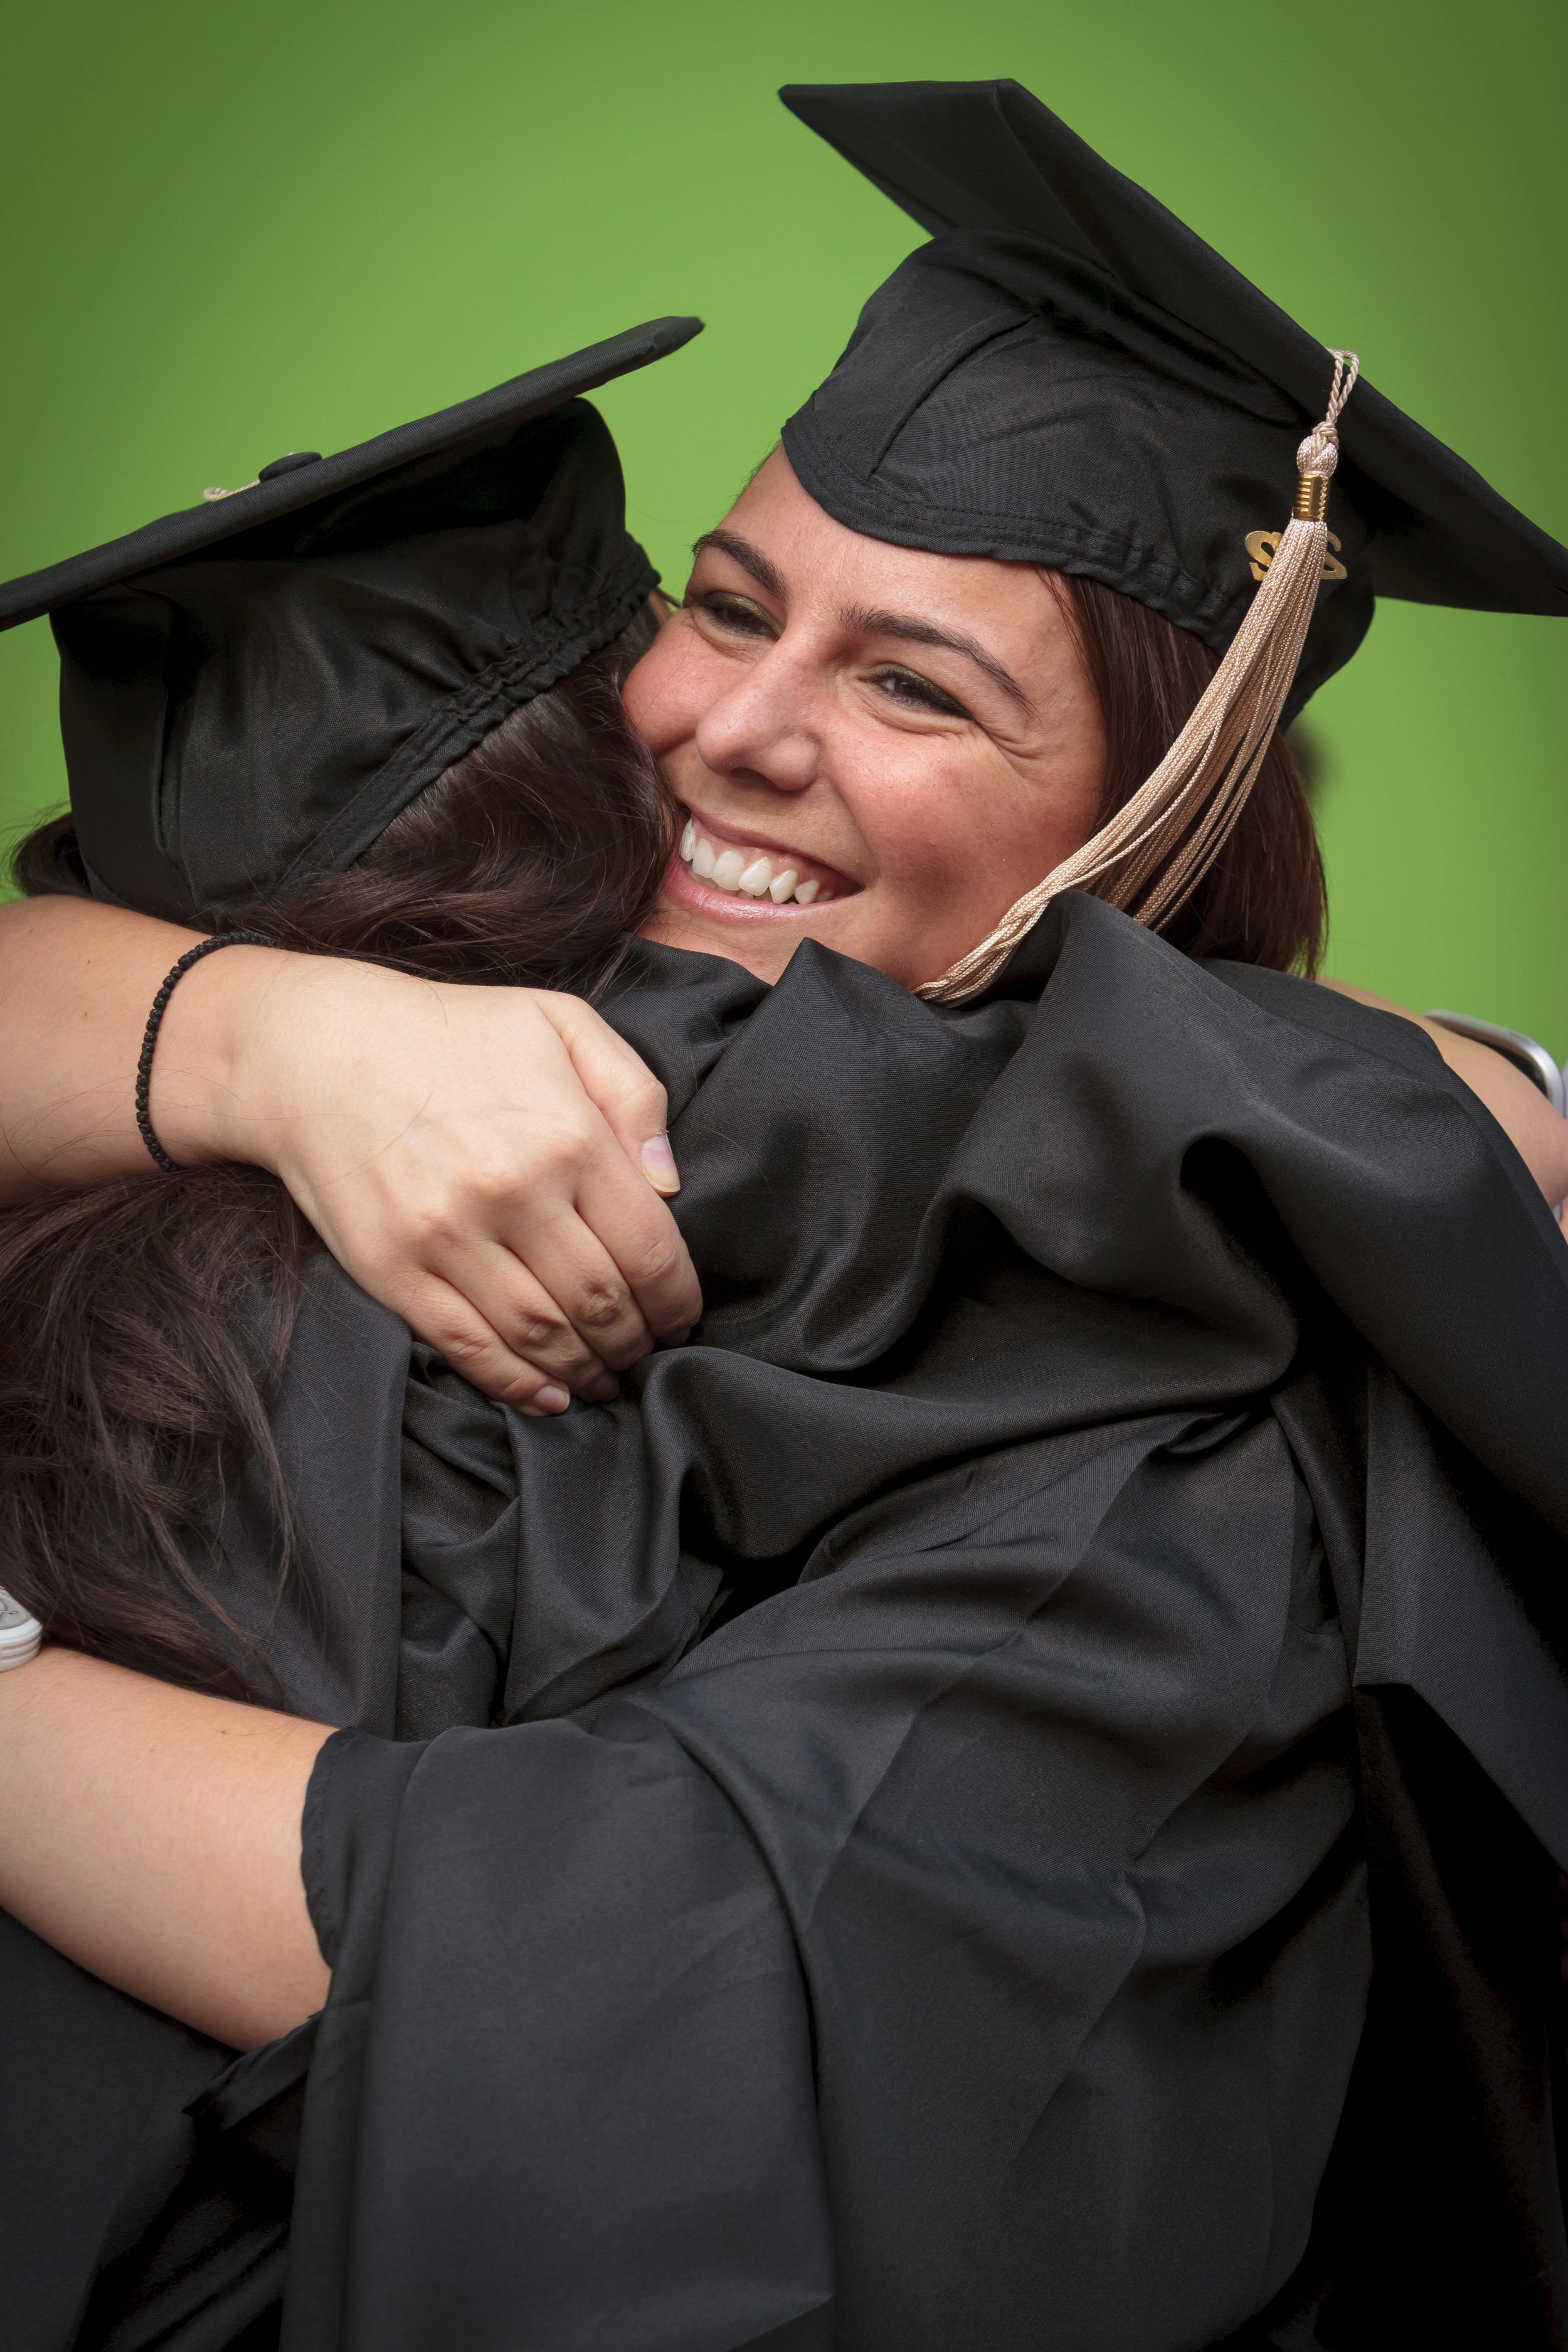 120504_RU_Graduation_2390_1.jpg